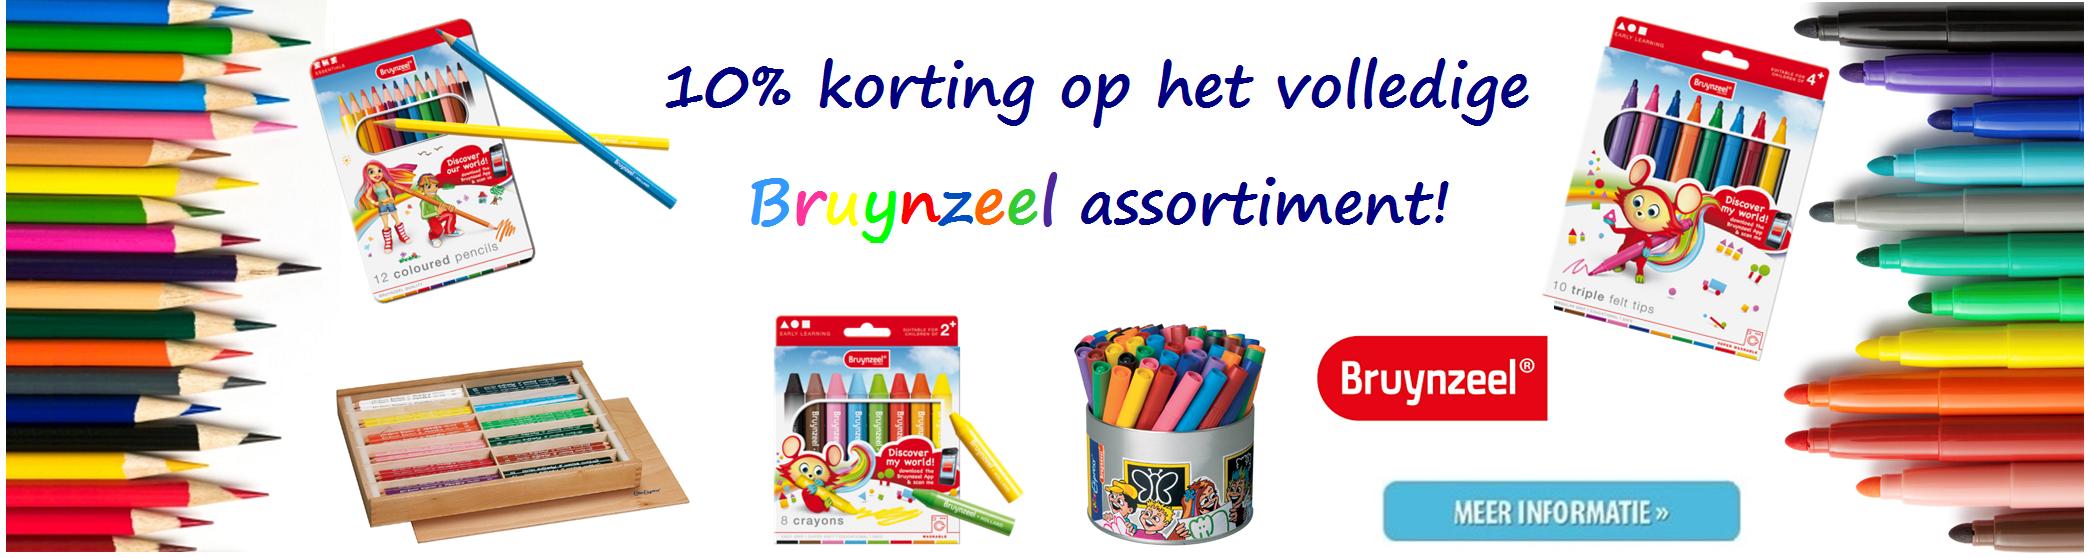 Bruynzeel 10% korting